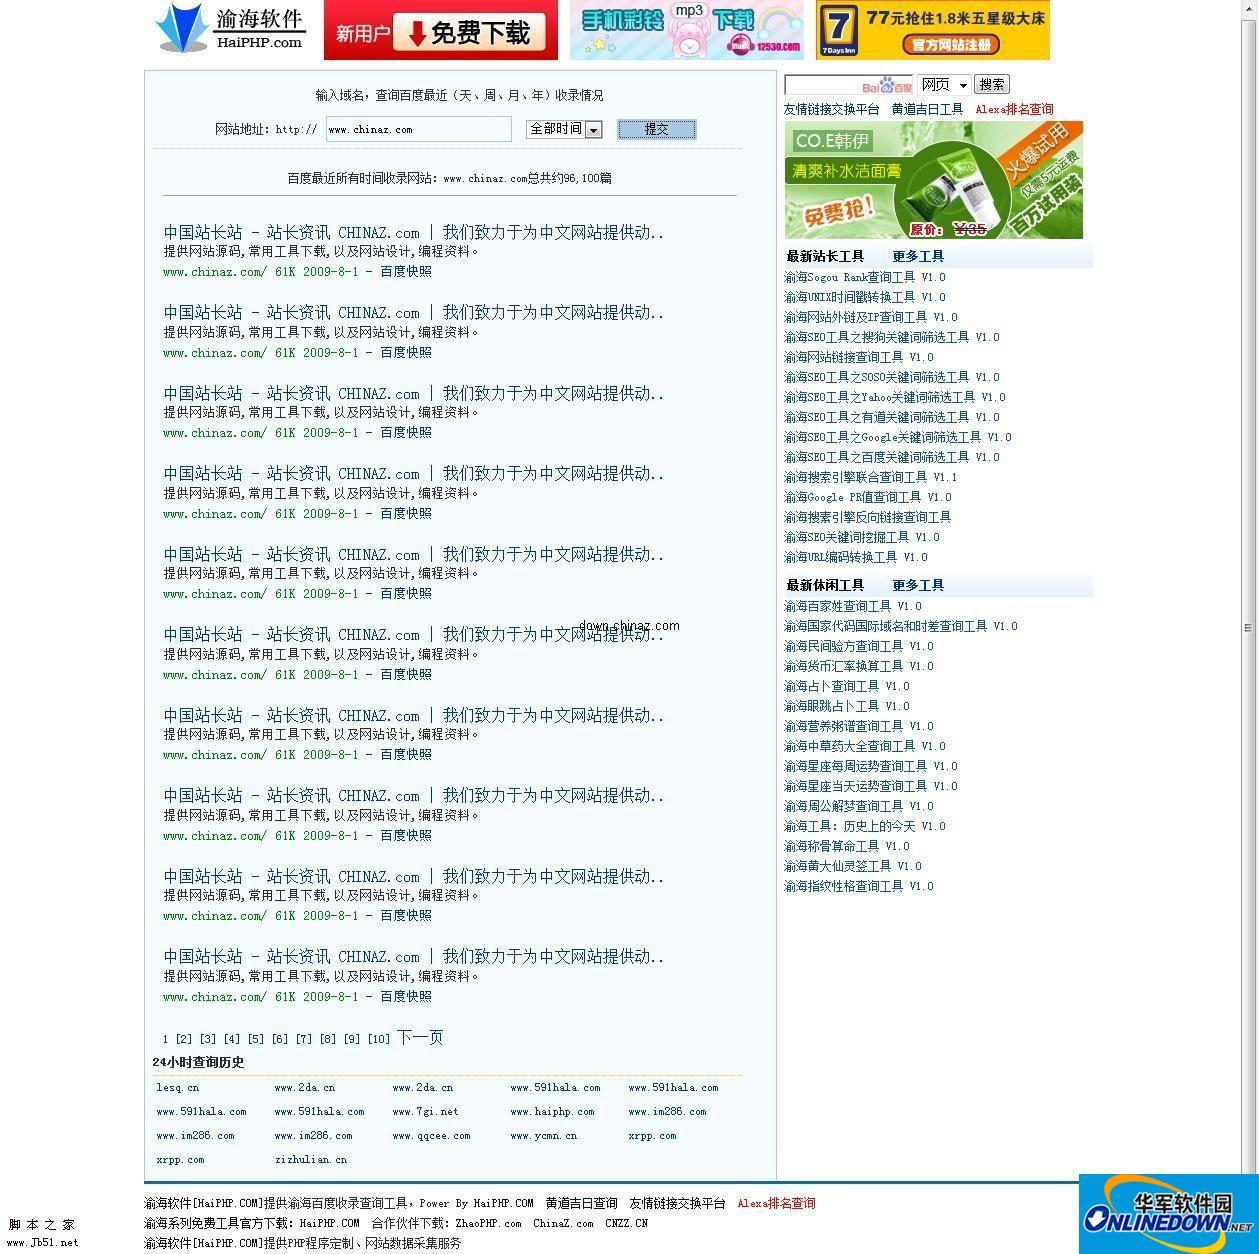 php 渝海百度收录查询工具